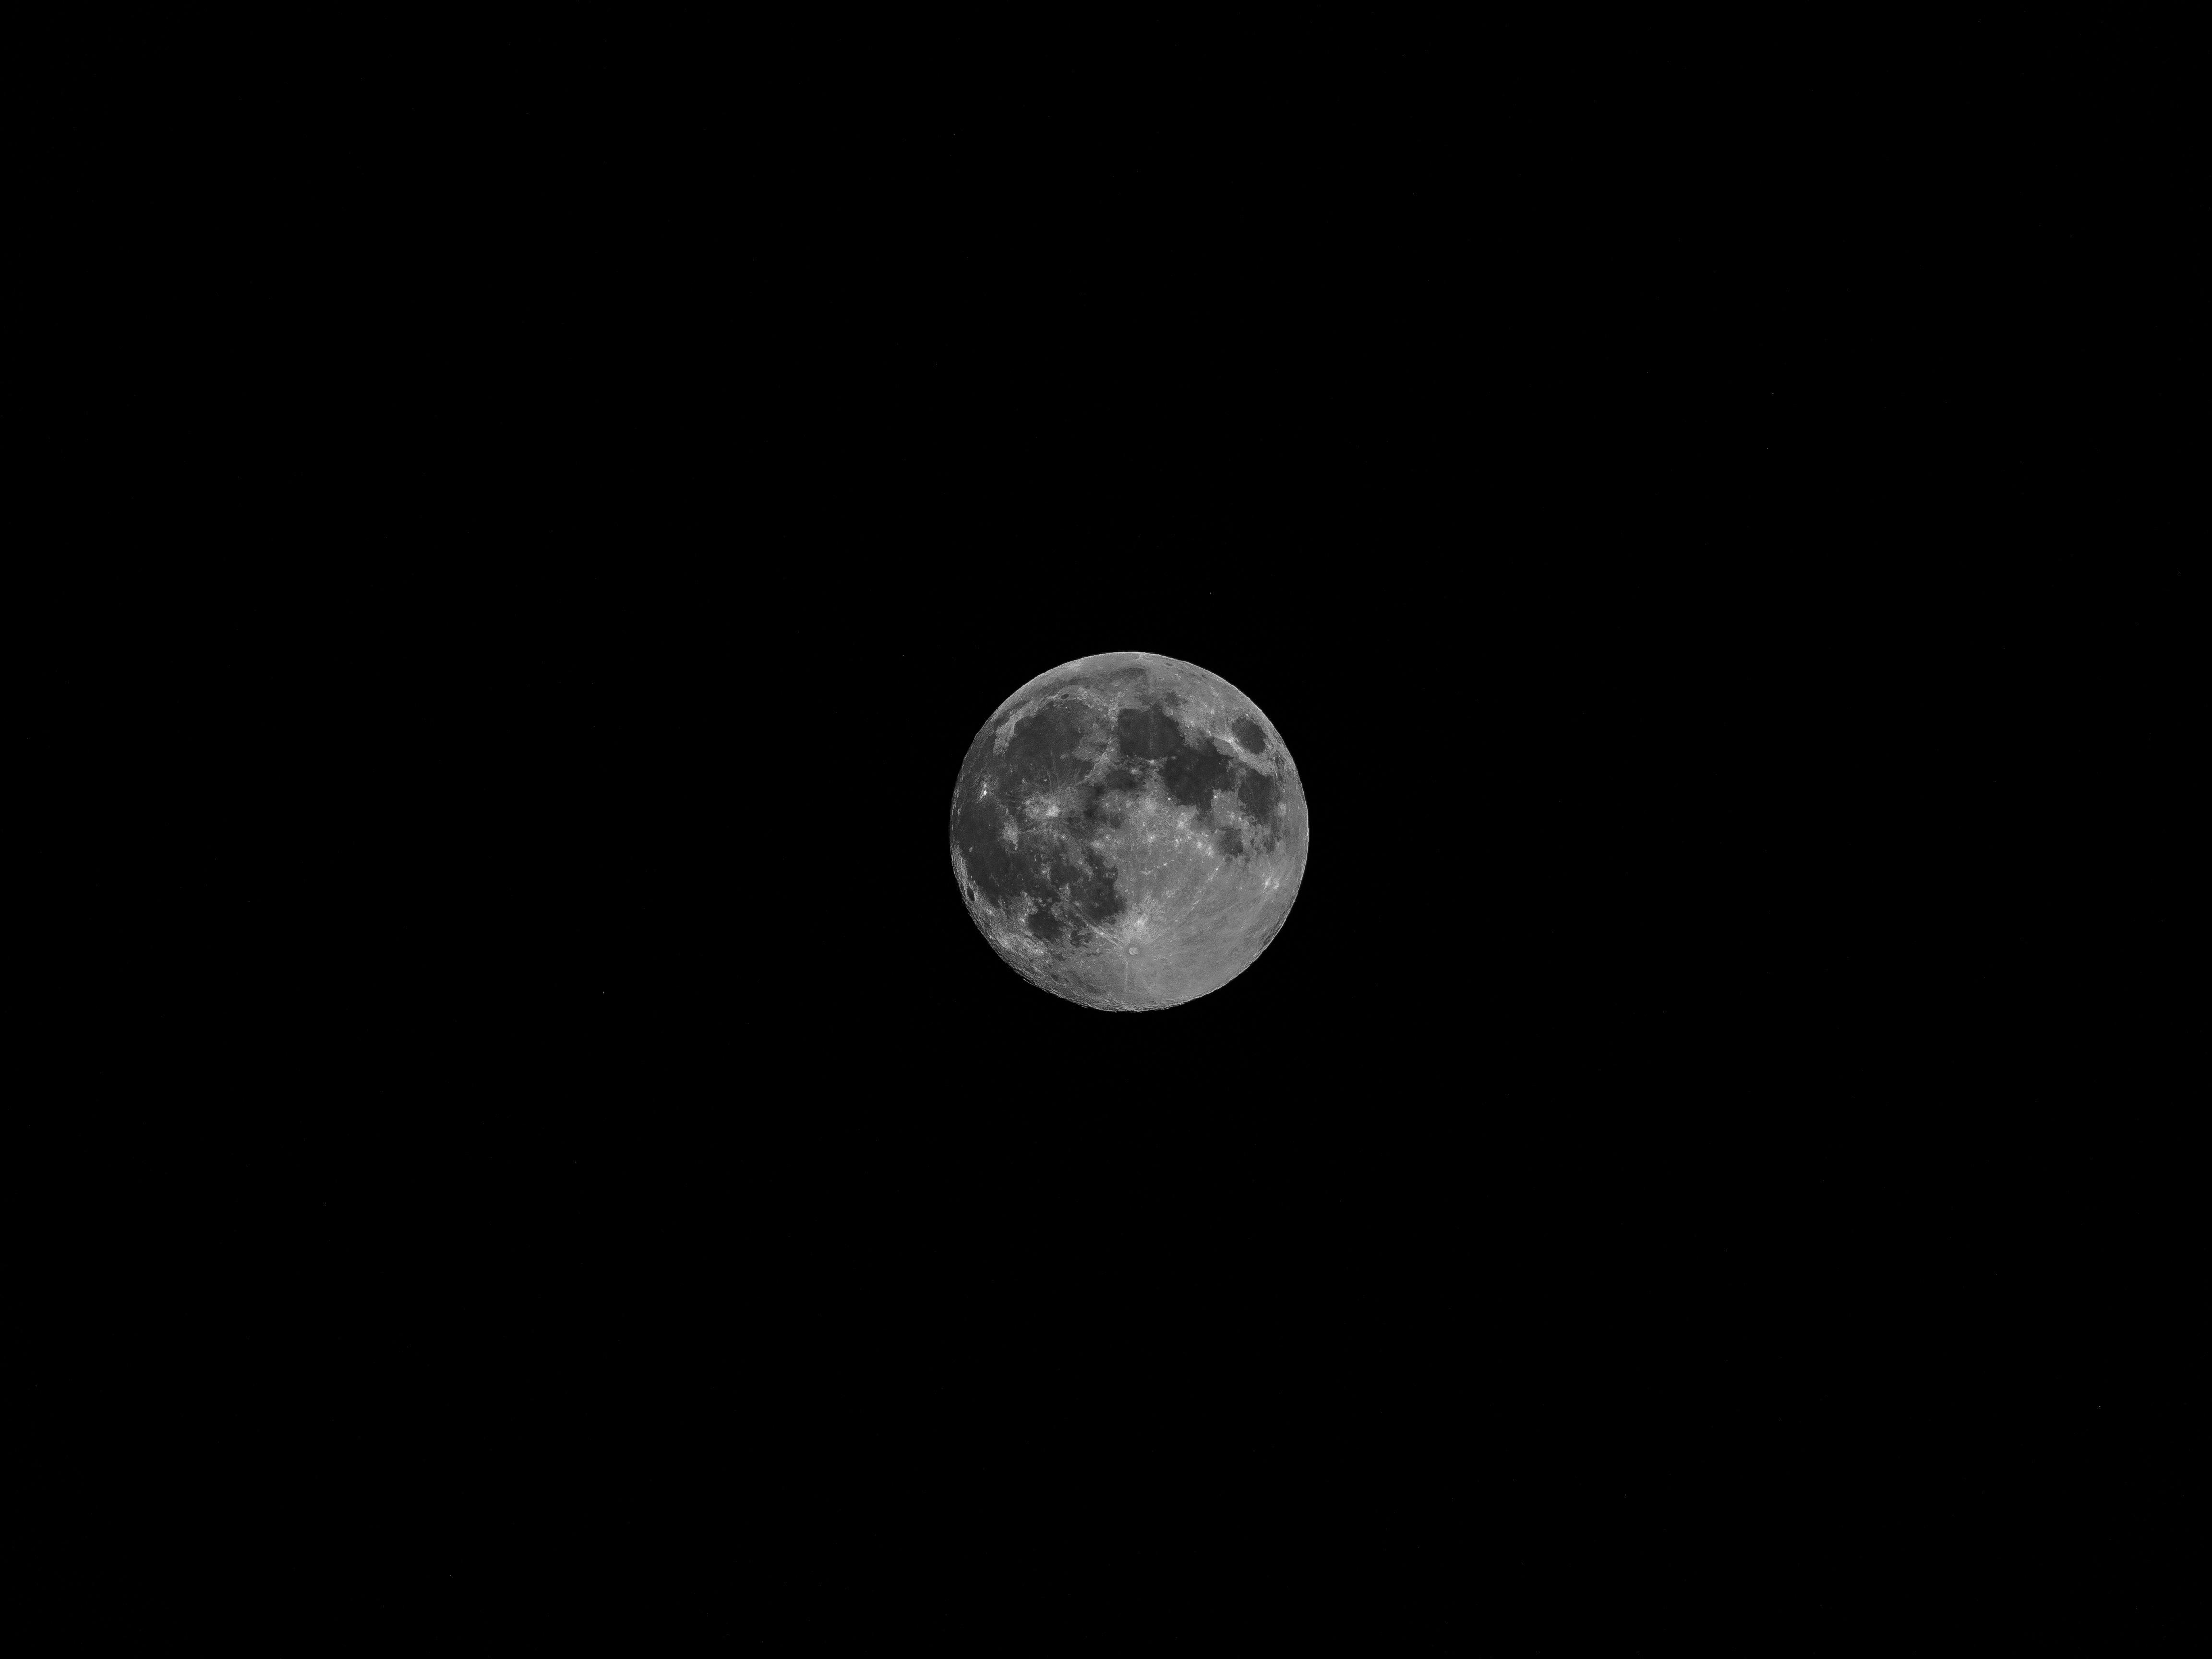 Gambar Hitam Dan Putih Langit Suasana Bulan Purnama Lingkaran